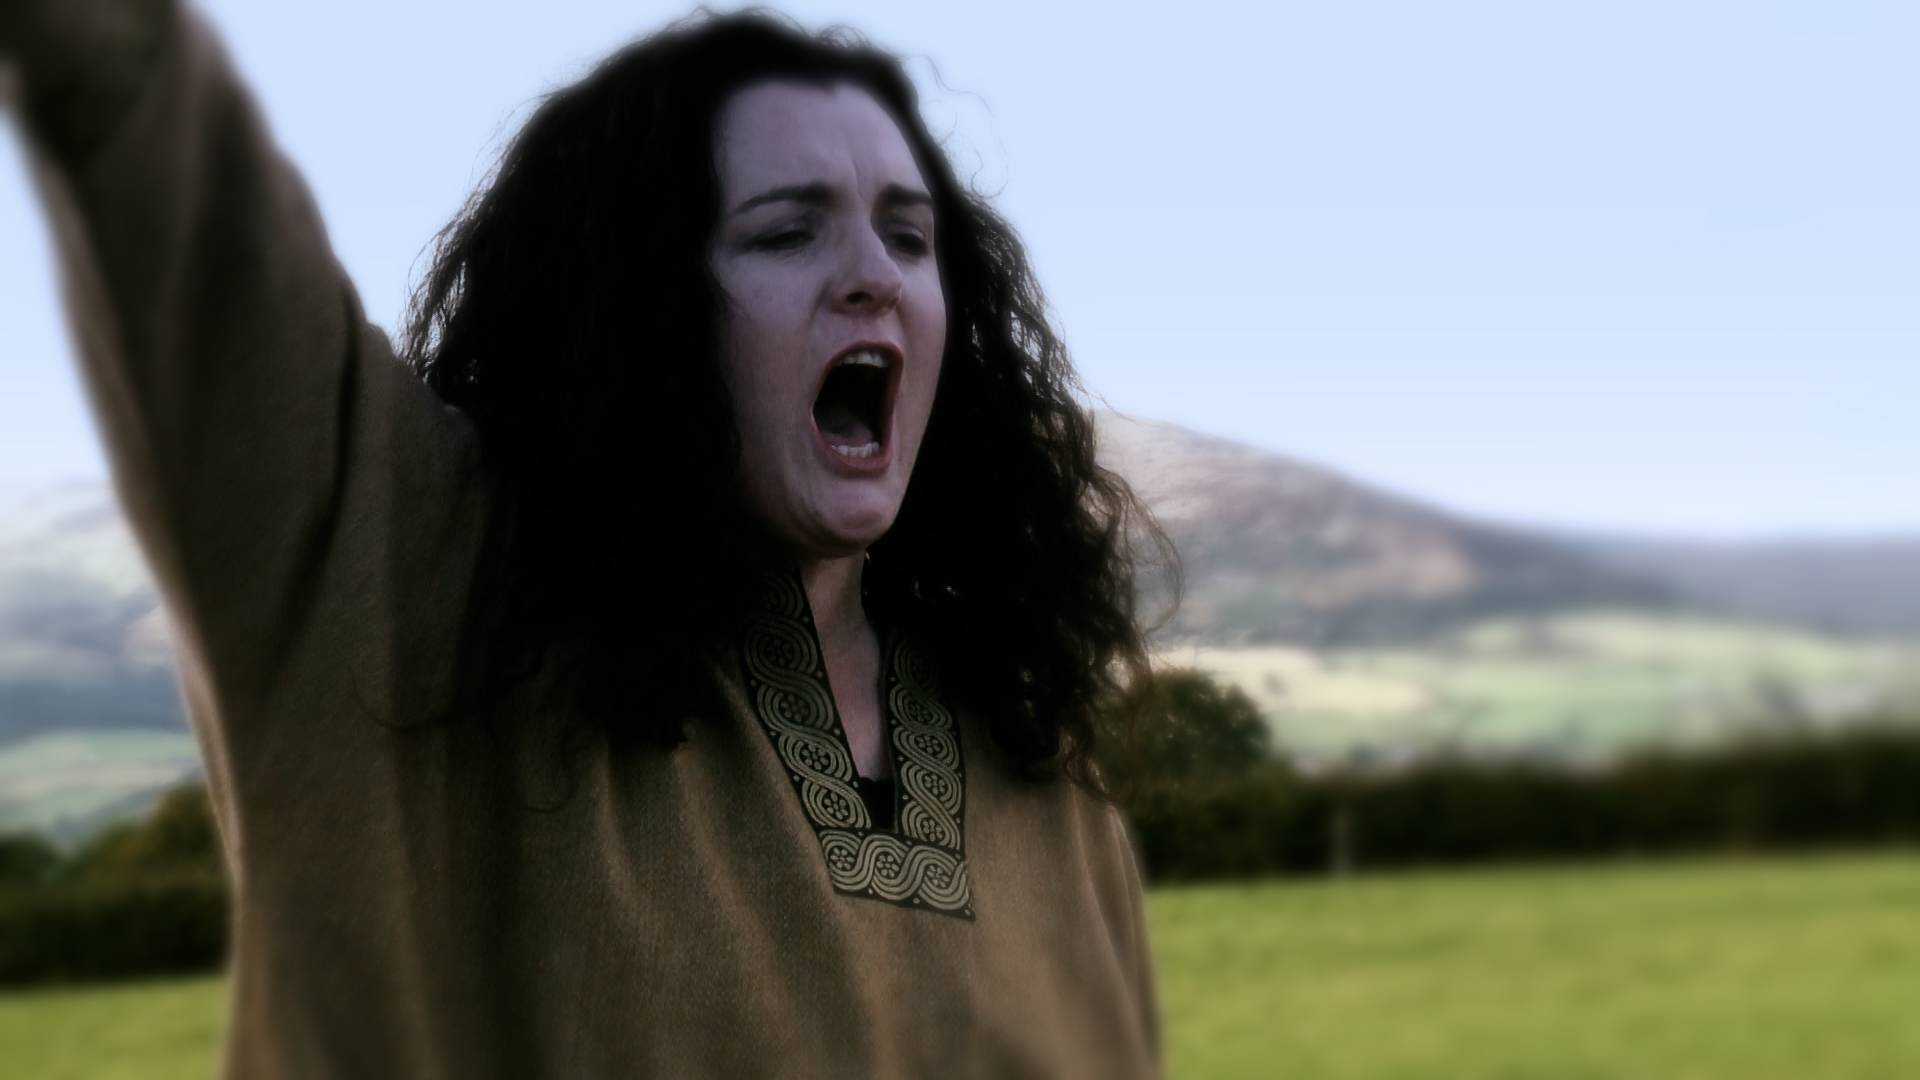 """Grainne Uaile "", ""The Movie"",""Irish actress"", ""Irish actor"",""Actress"",""Irish Film Actress"", ""Fionnuala Collins"","